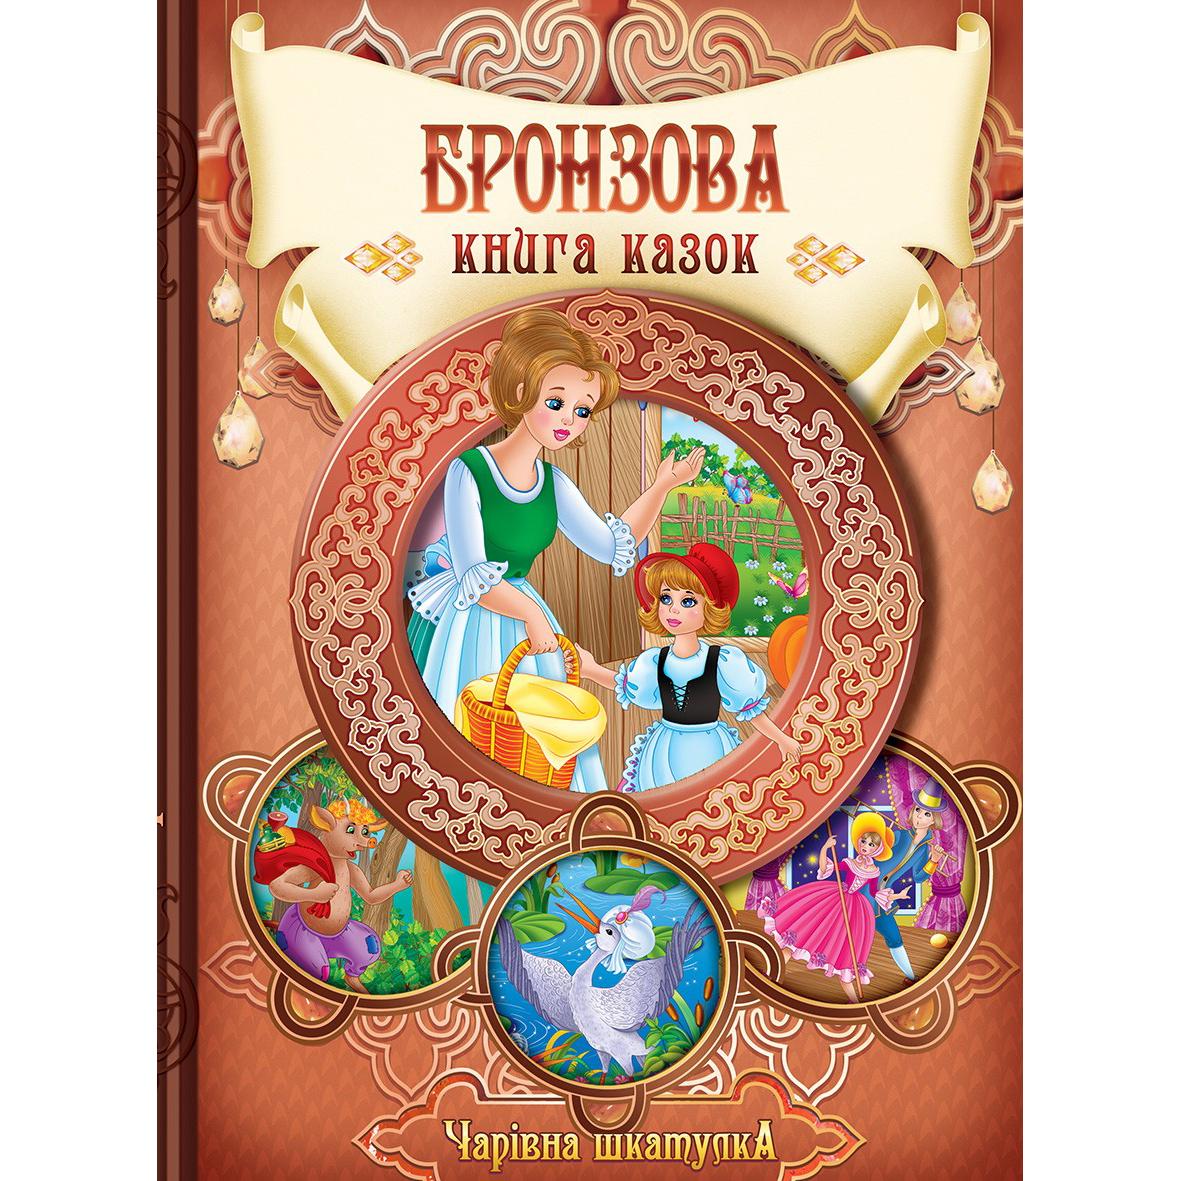 Купити дитячу книгу Бронзова книга казок, збірка казок | Bukio